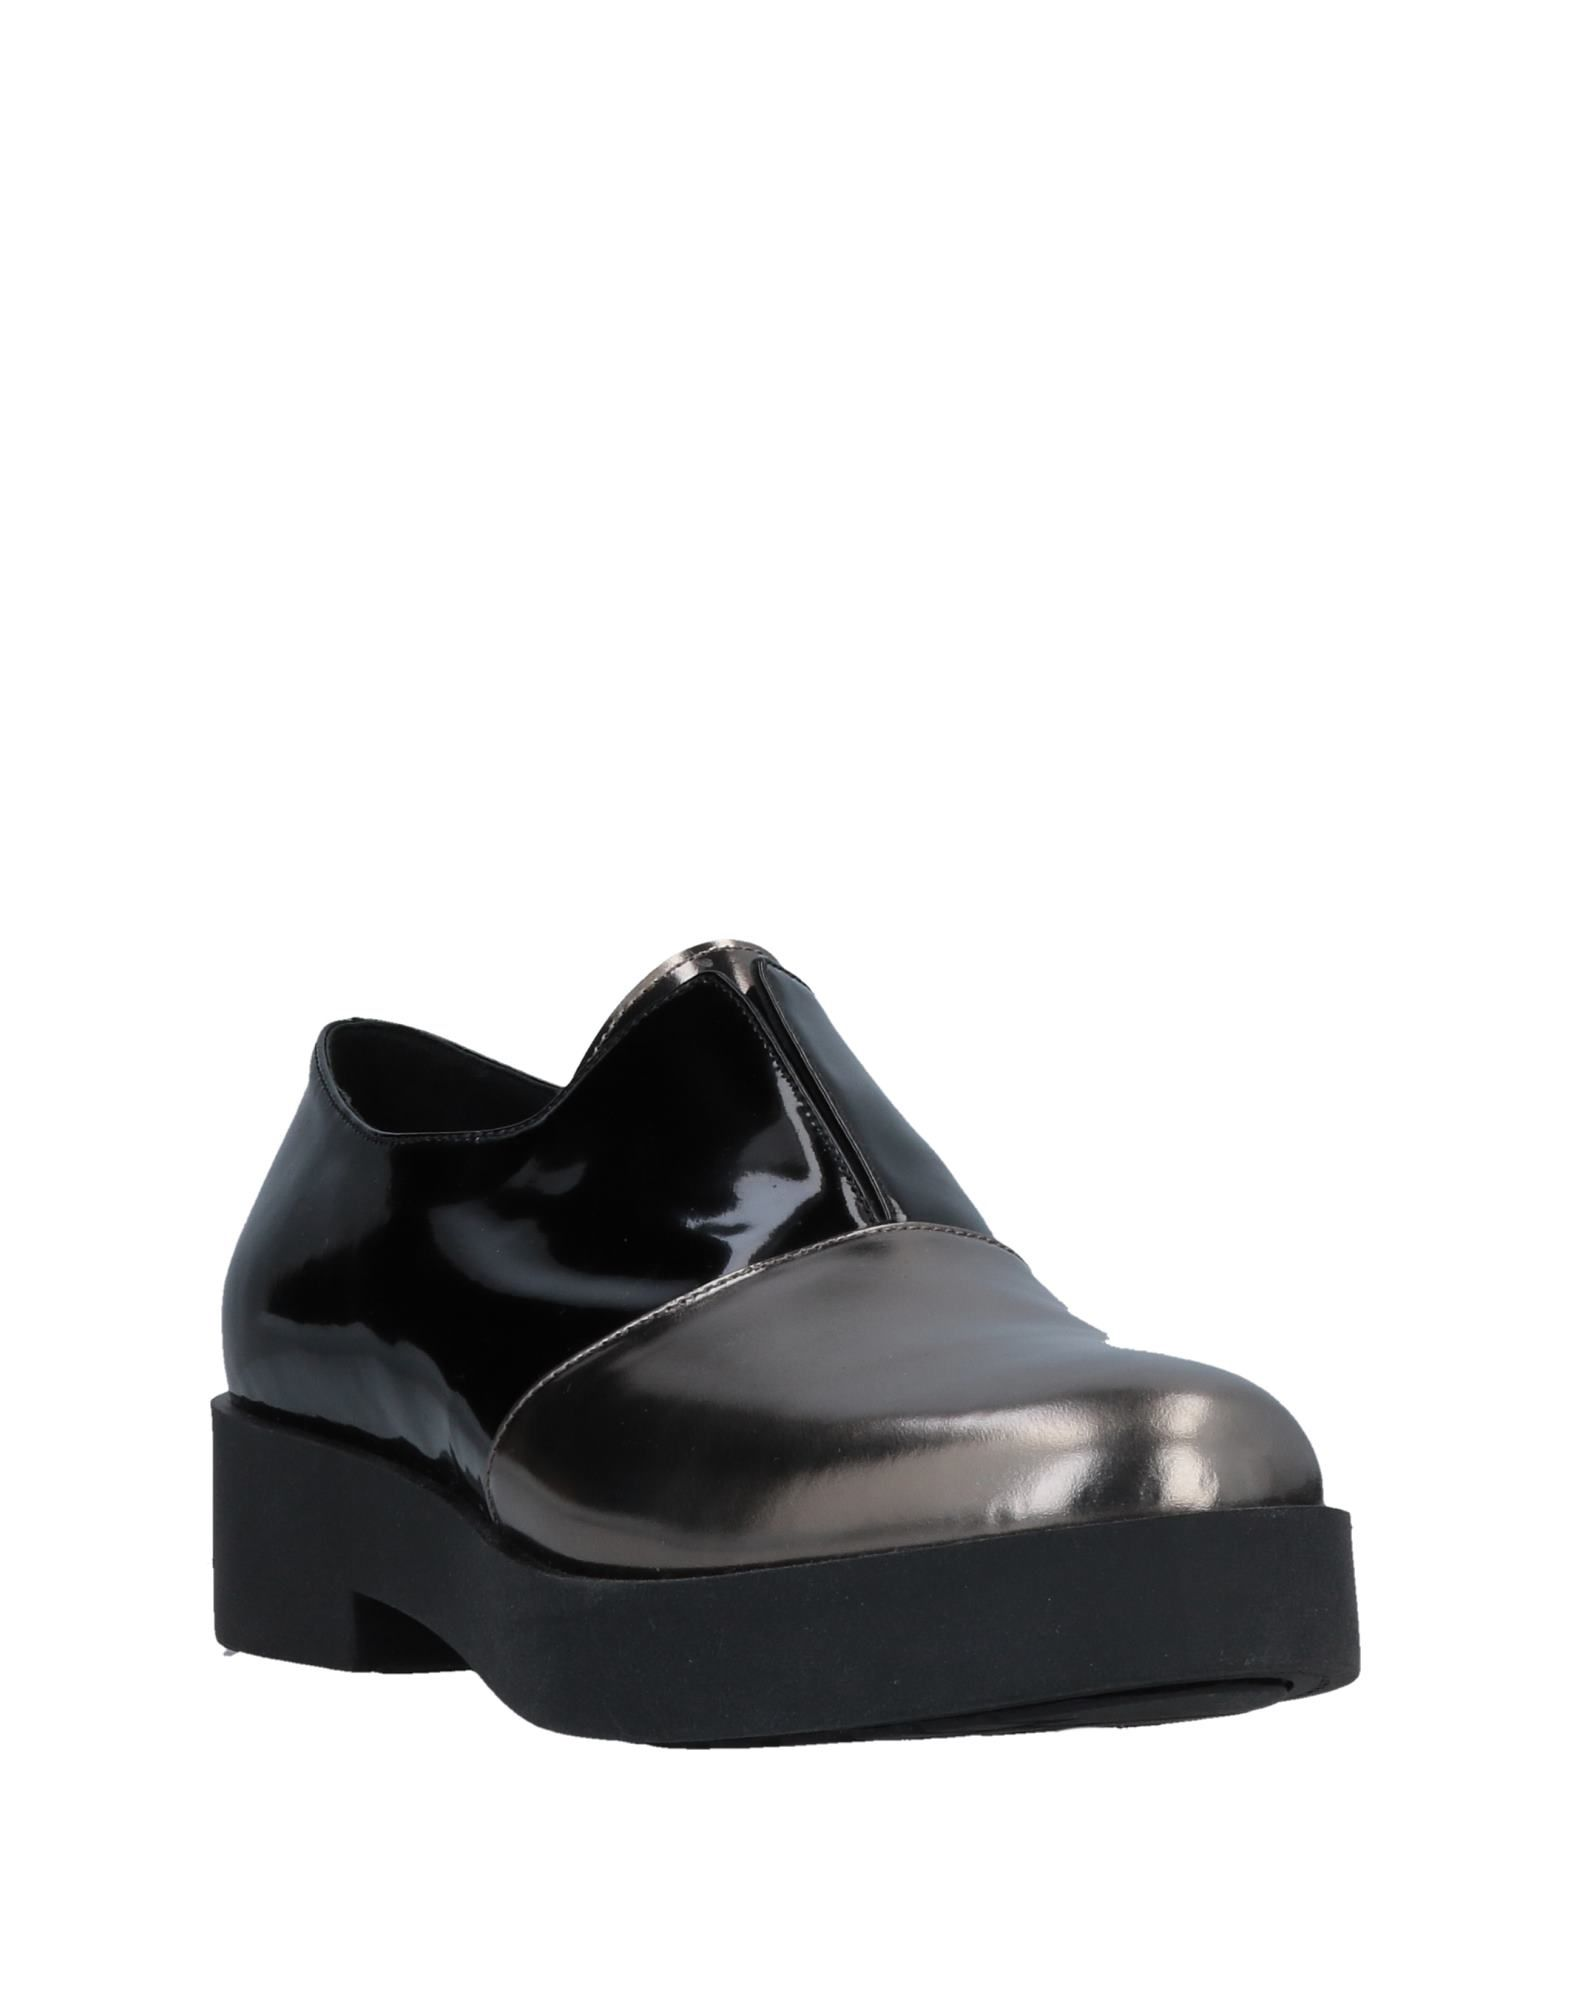 Stilvolle billige Schuhe Rosamunda Mokassins Damen  11511479UV 11511479UV 11511479UV 4e7d4f